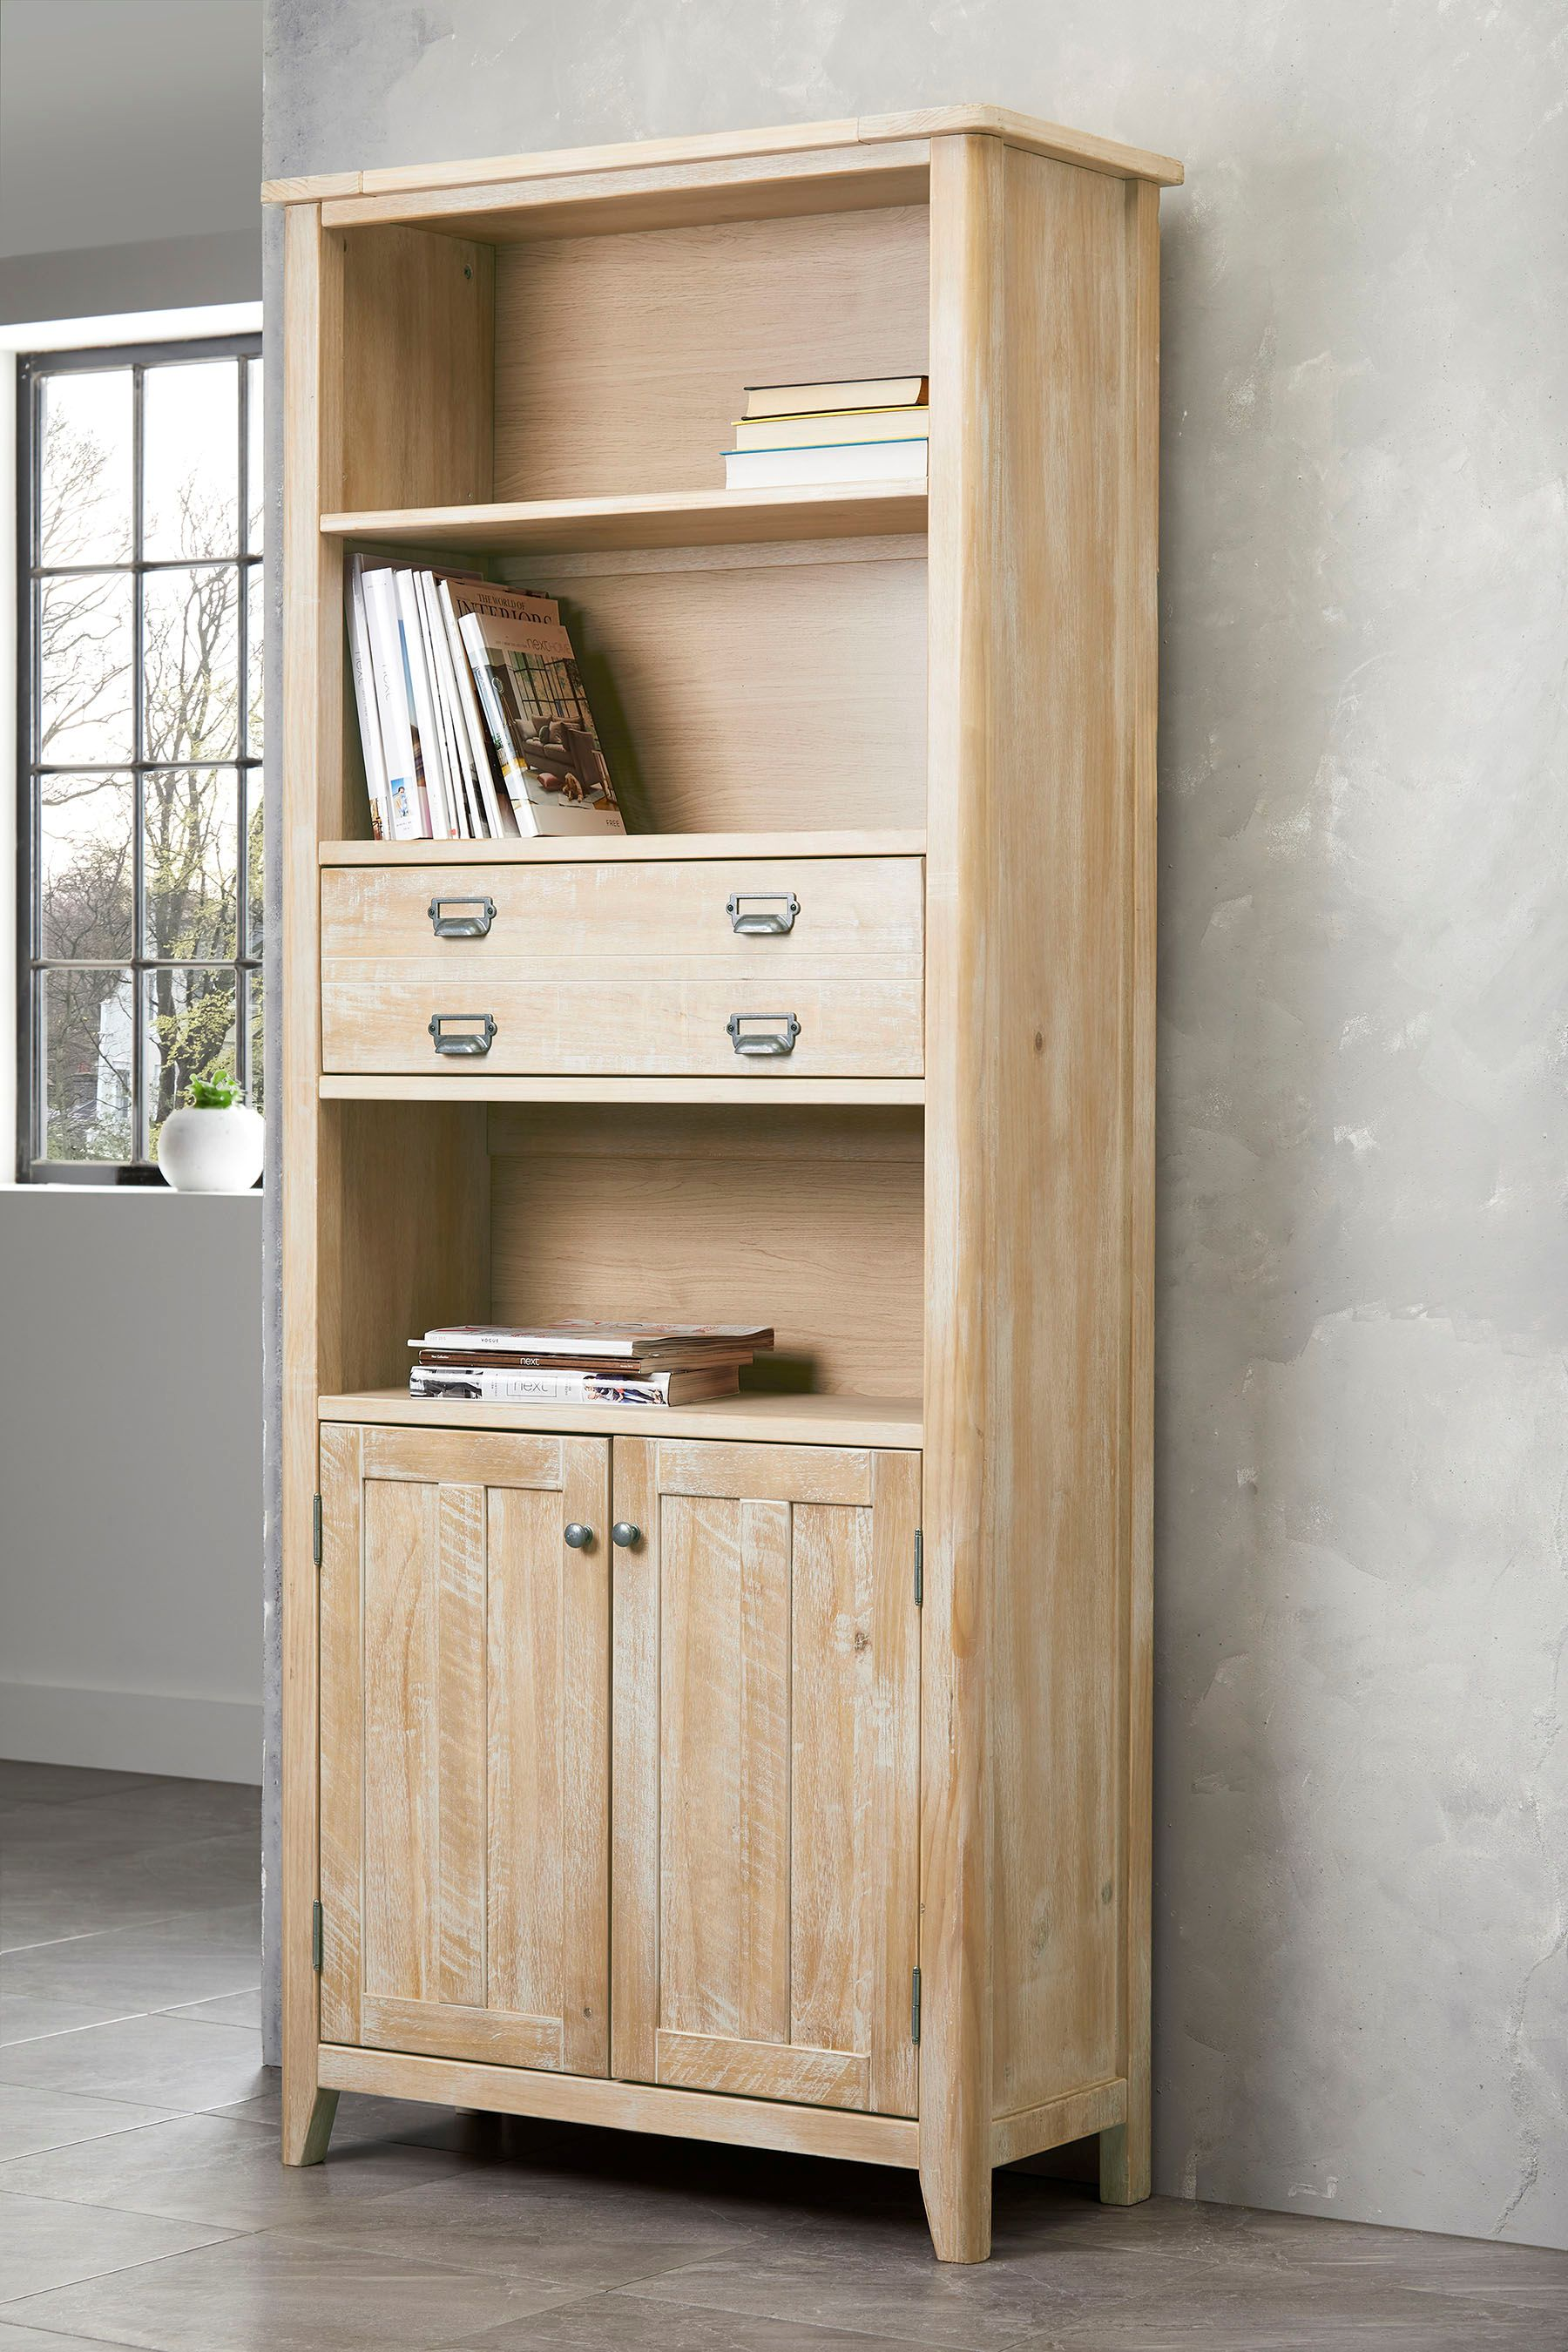 Next Huxley Bookcase Natural Mattress furniture